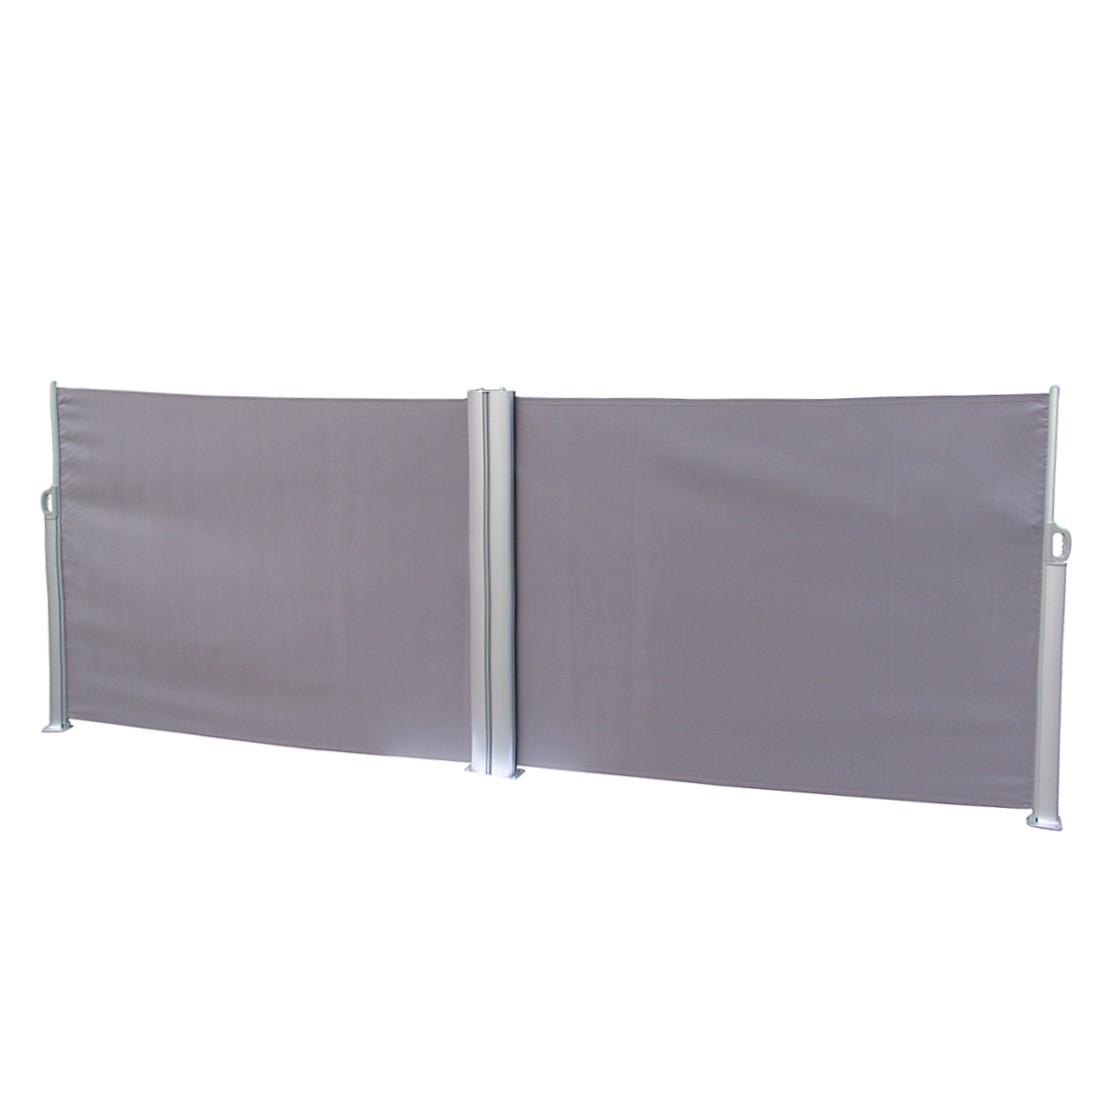 Dubbele zijluifel Rush - aluminium/polyester antracietkleurig, Leco